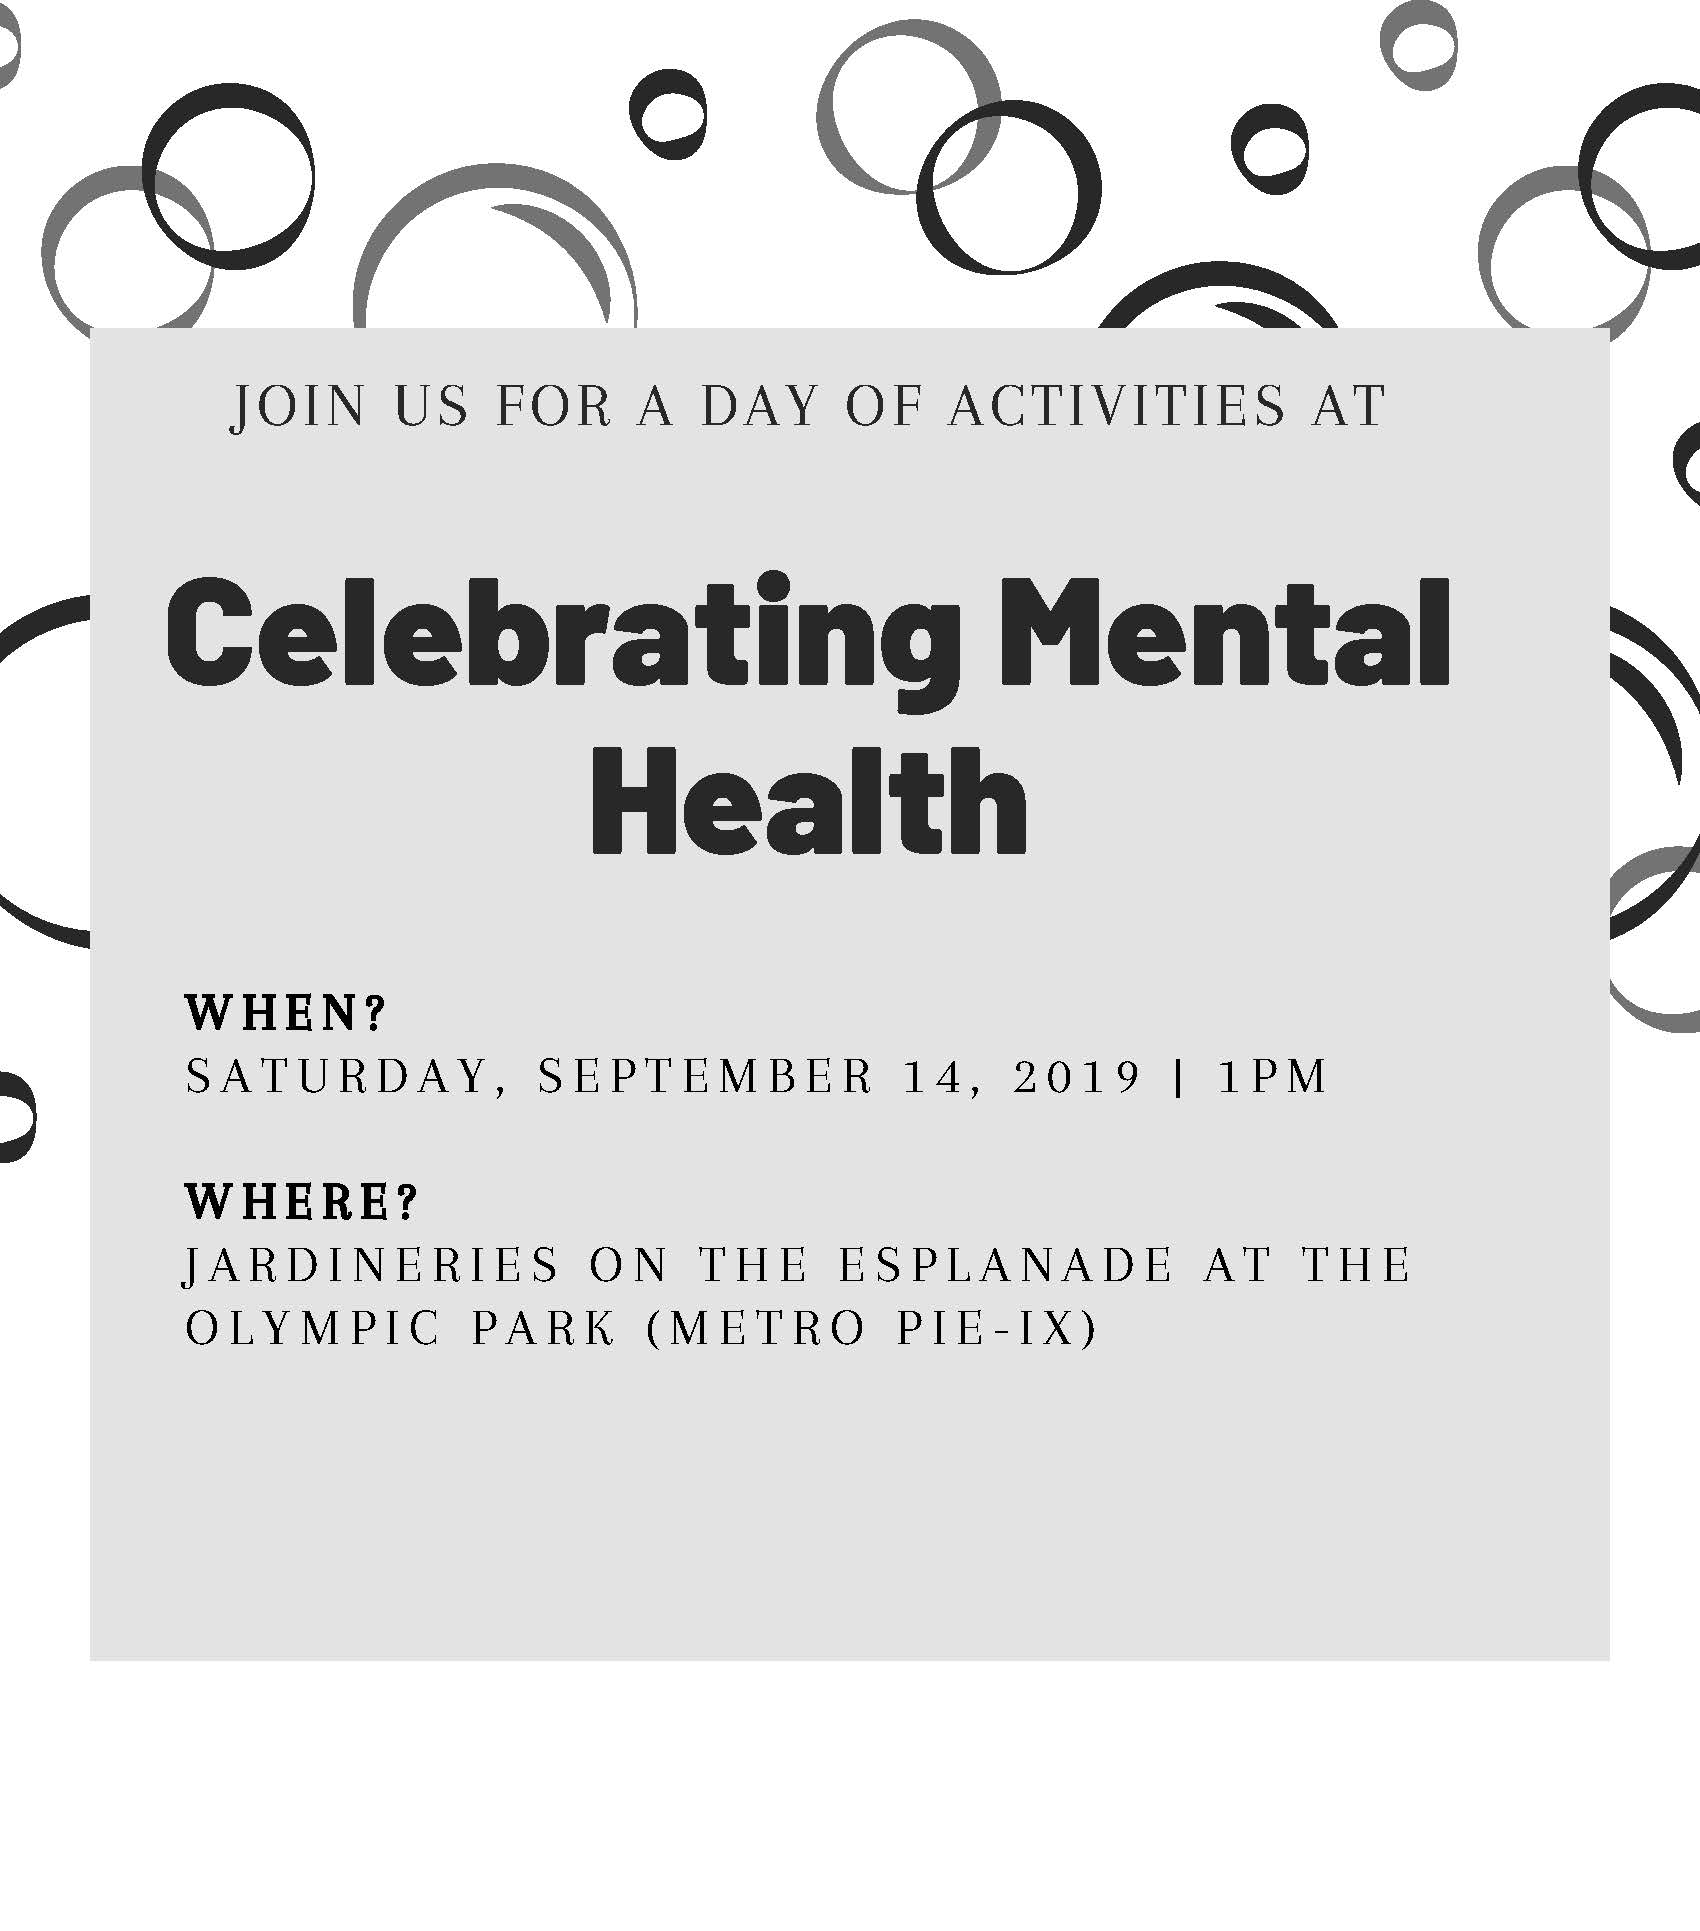 Celebrating Mental Health Day 2019